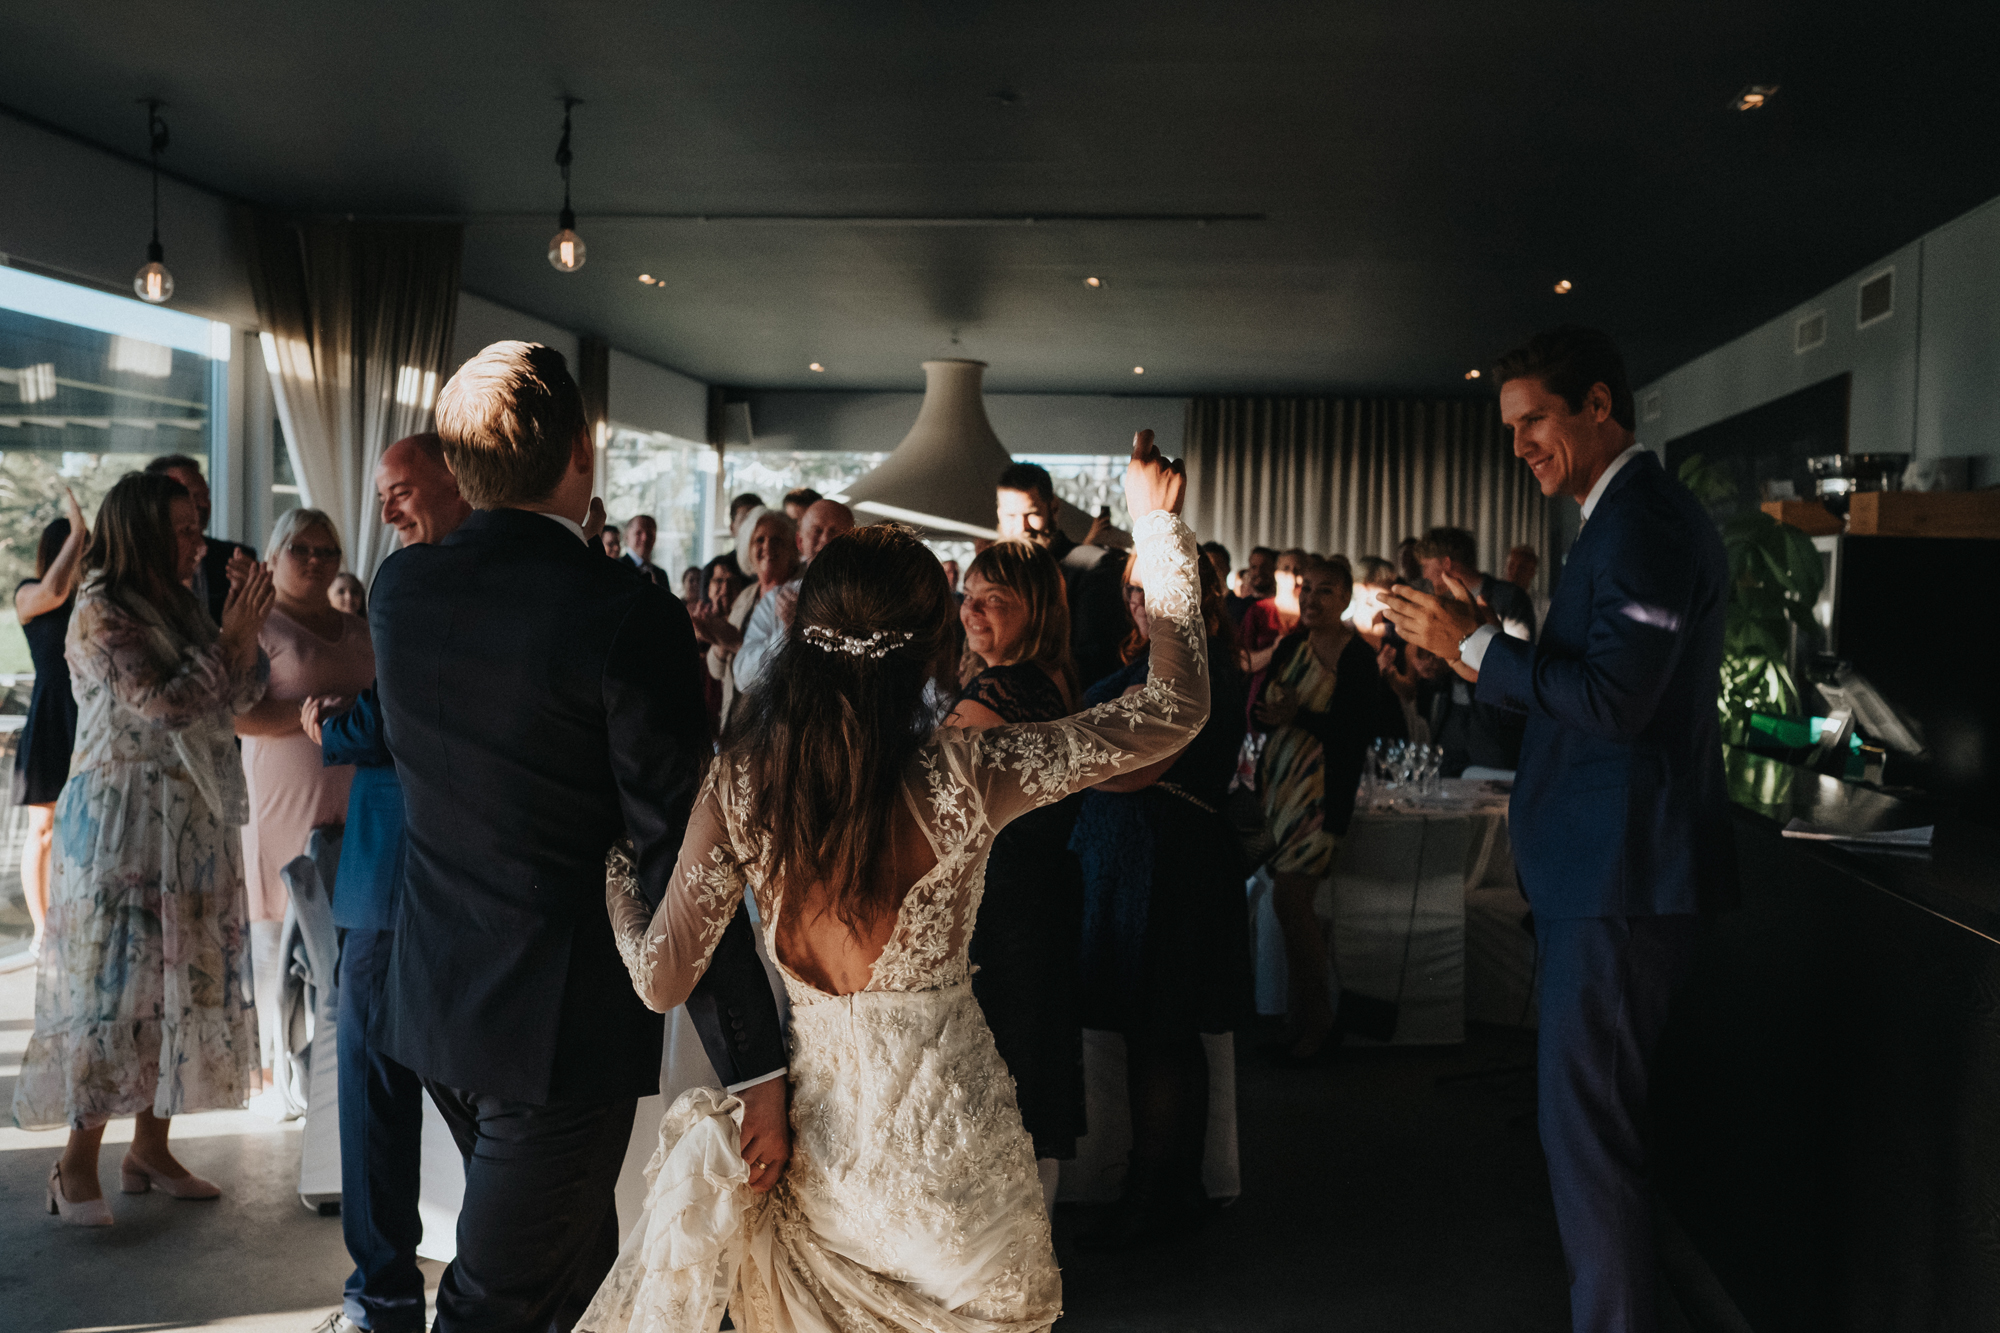 057-bröllop-djupvik-hotel-neas-fotografi.jpg